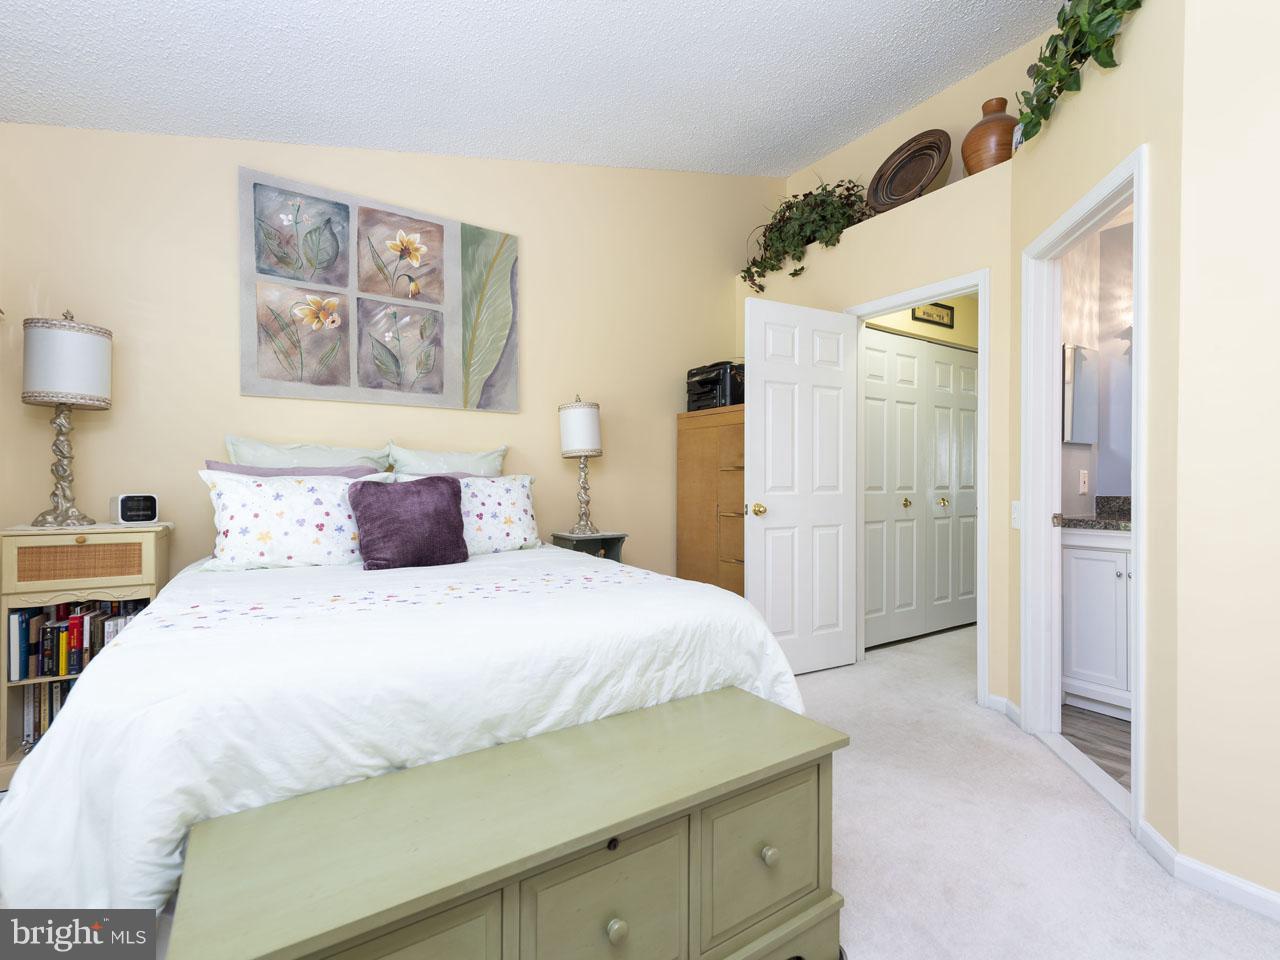 1002640508-300537944321-2021-07-22-05-00-38     Pinecrest   Alexandria Delaware Real Estate For Sale   MLS# 1002640508  - Best of Northern Virginia